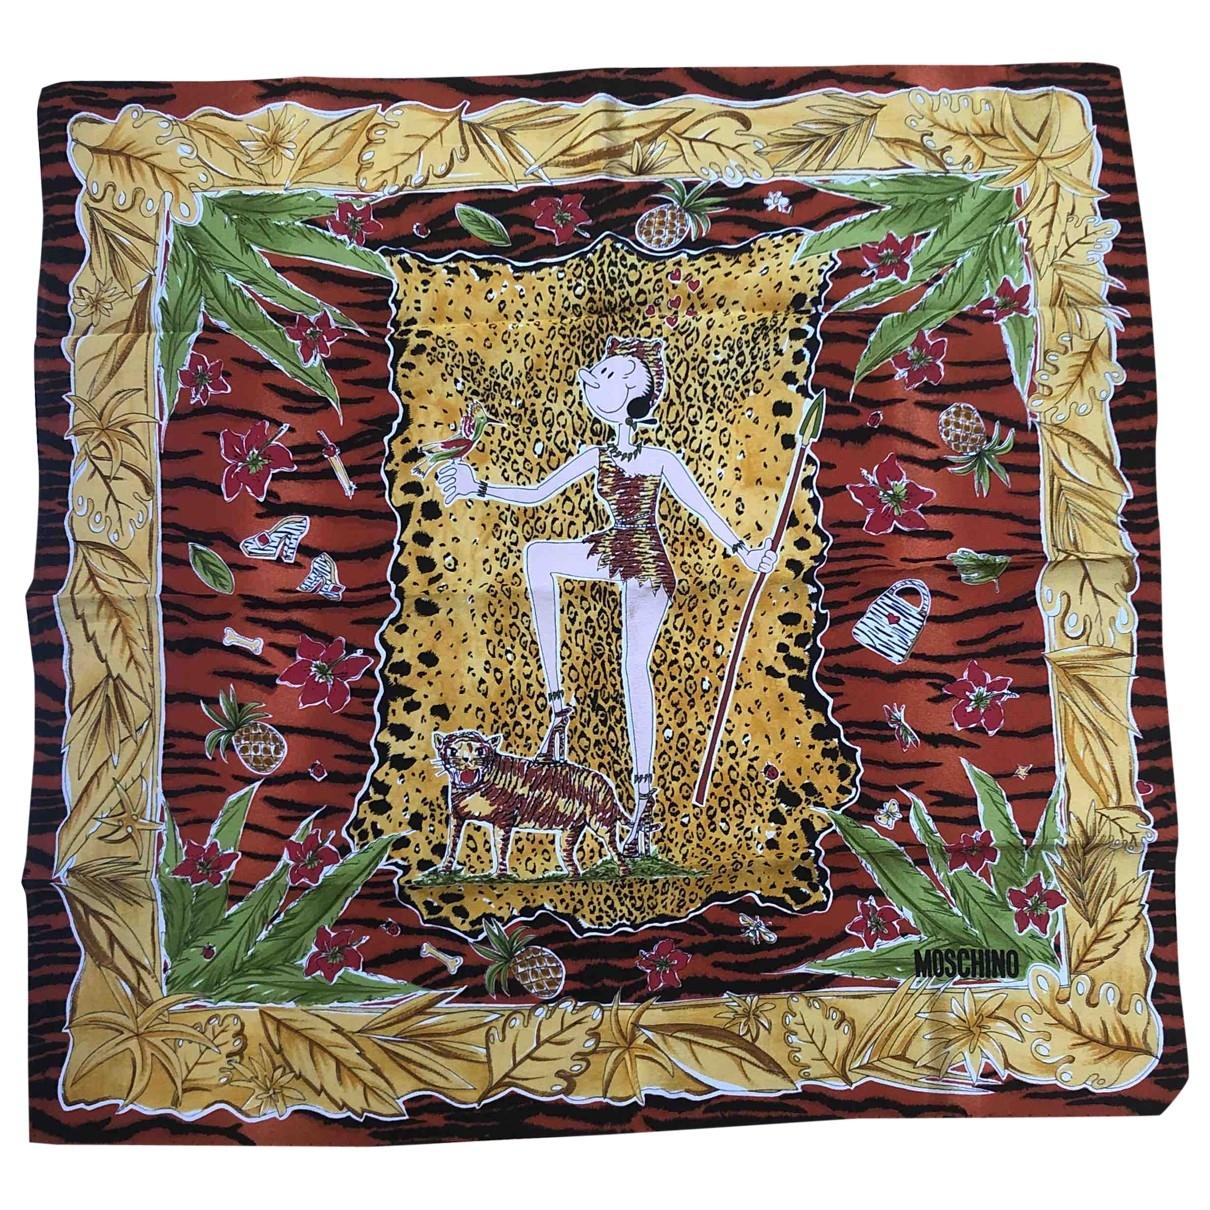 Pañuelo de Seda Moschino Cheap And Chic